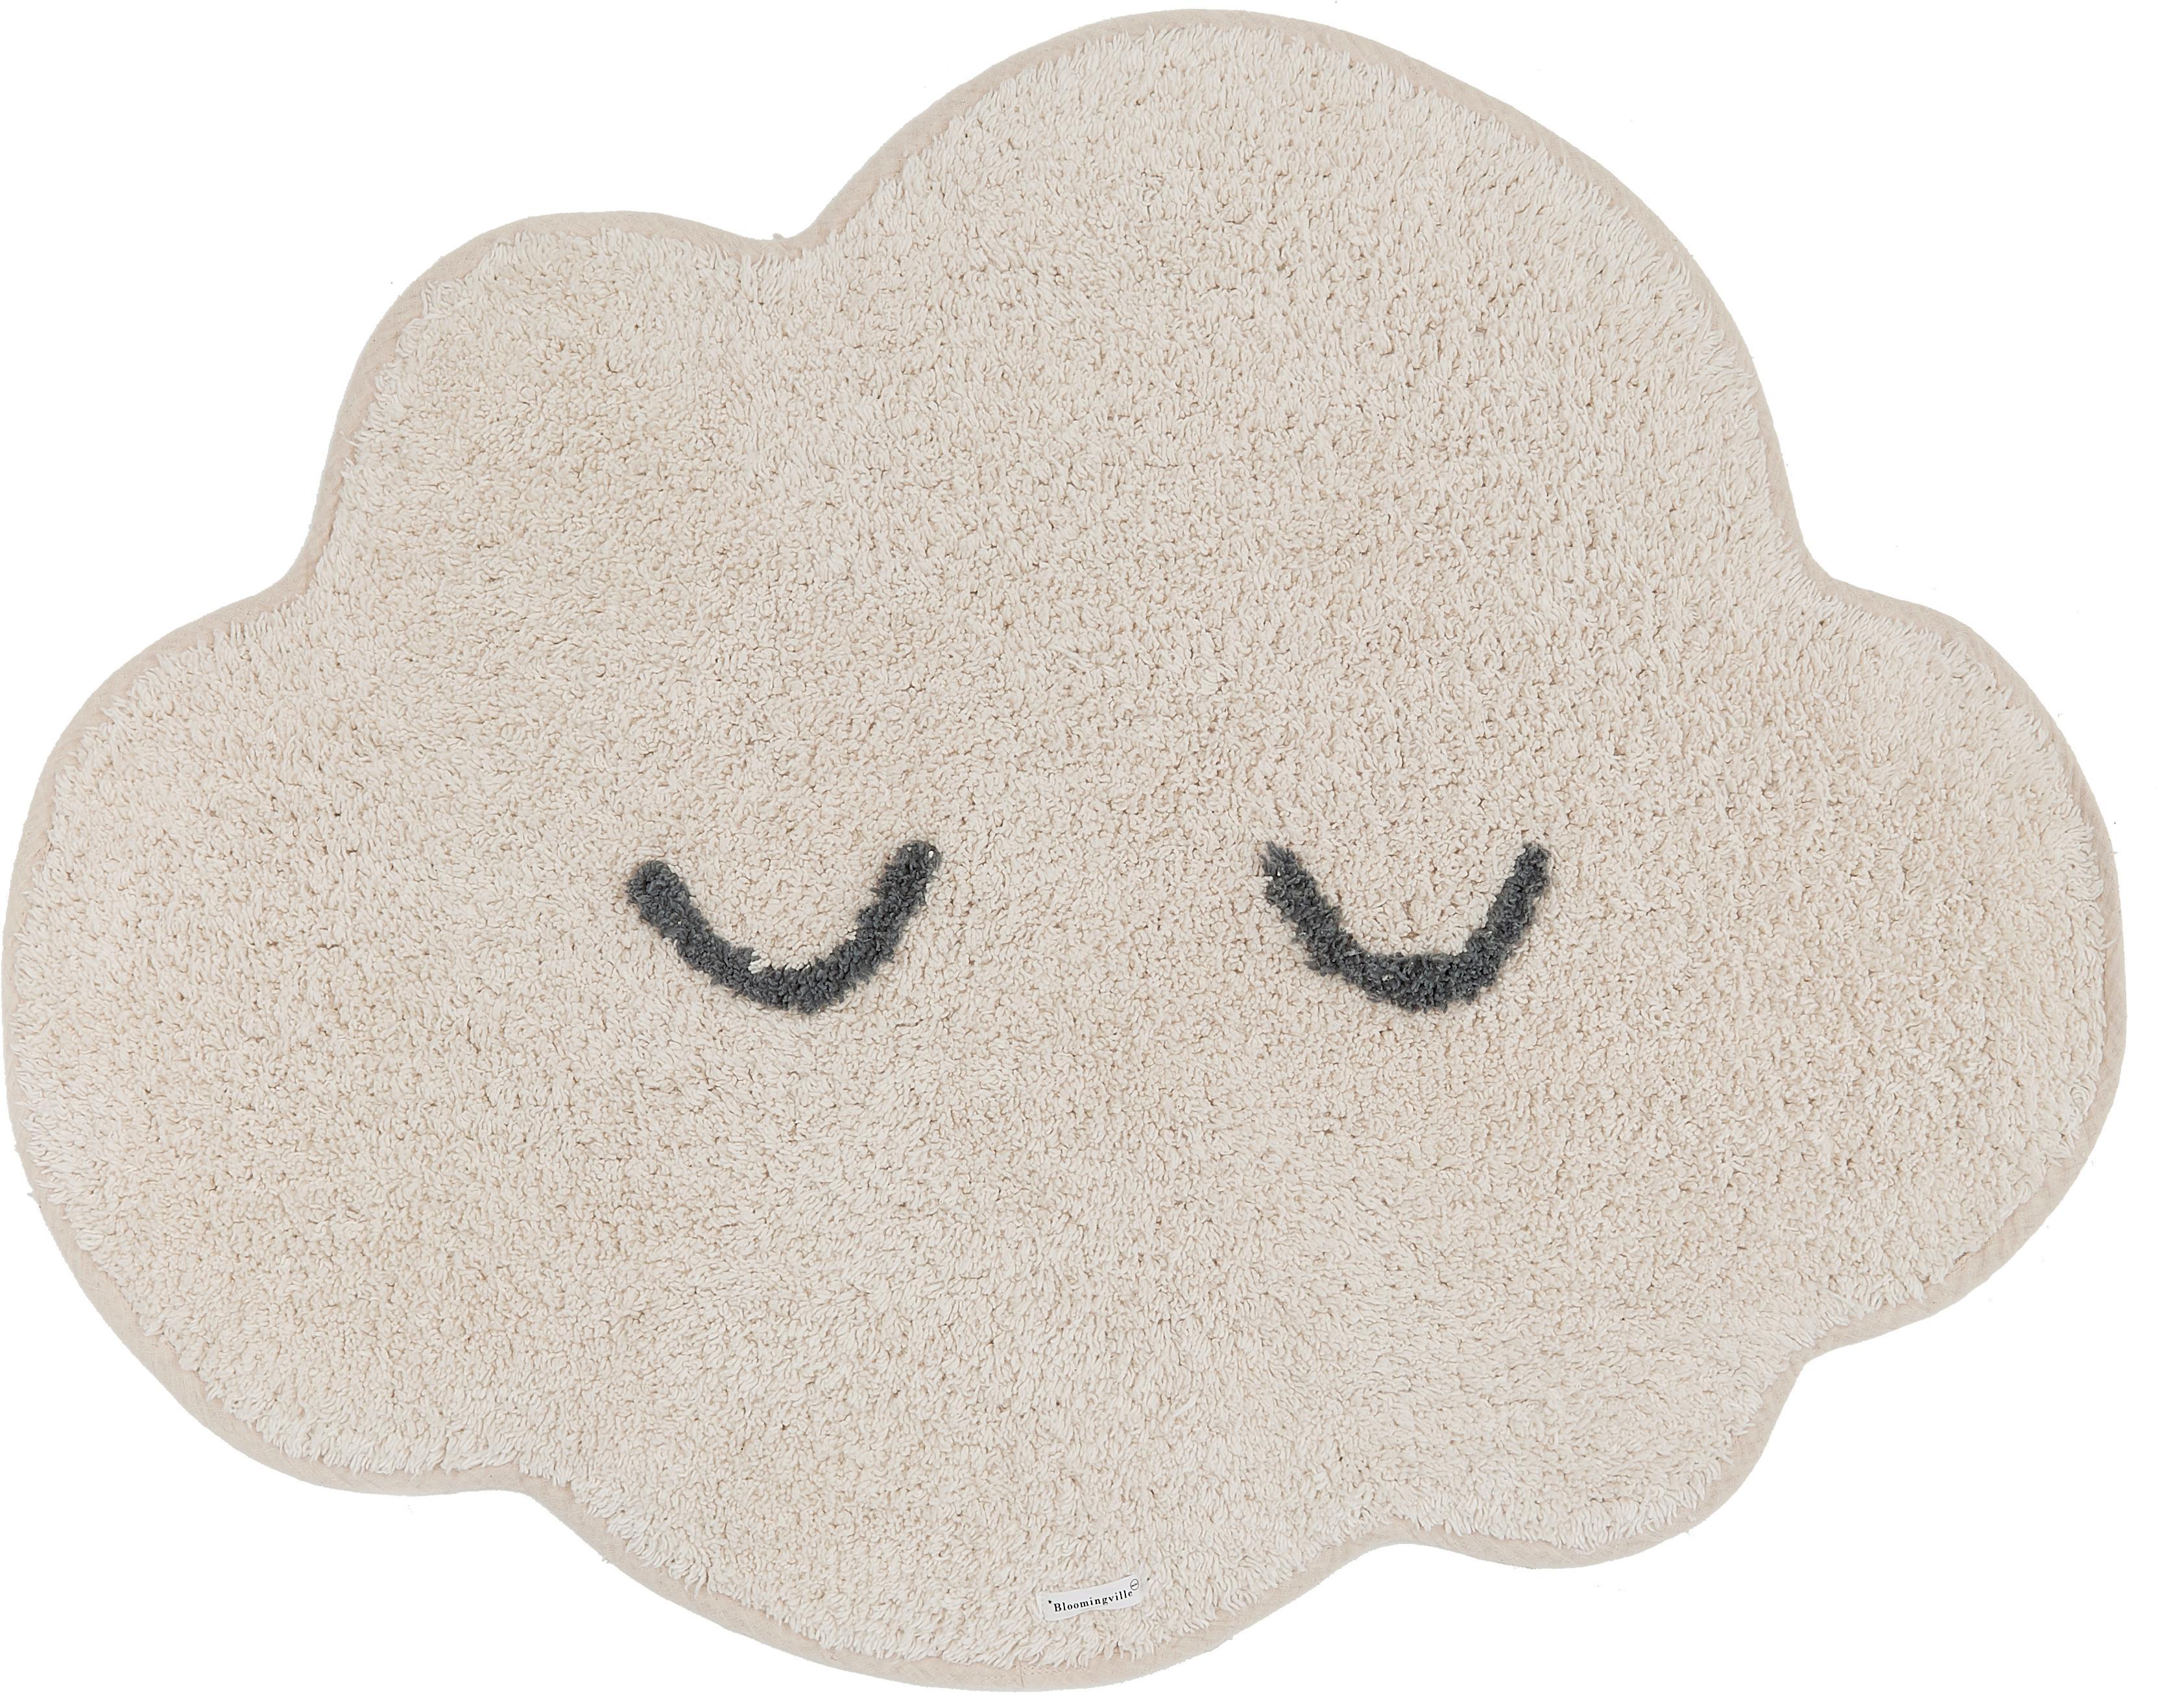 Tappeto in cotone a forma di nuvola  Cloud, Cotone, Beige, Larg. 57 x Lung. 82 cm